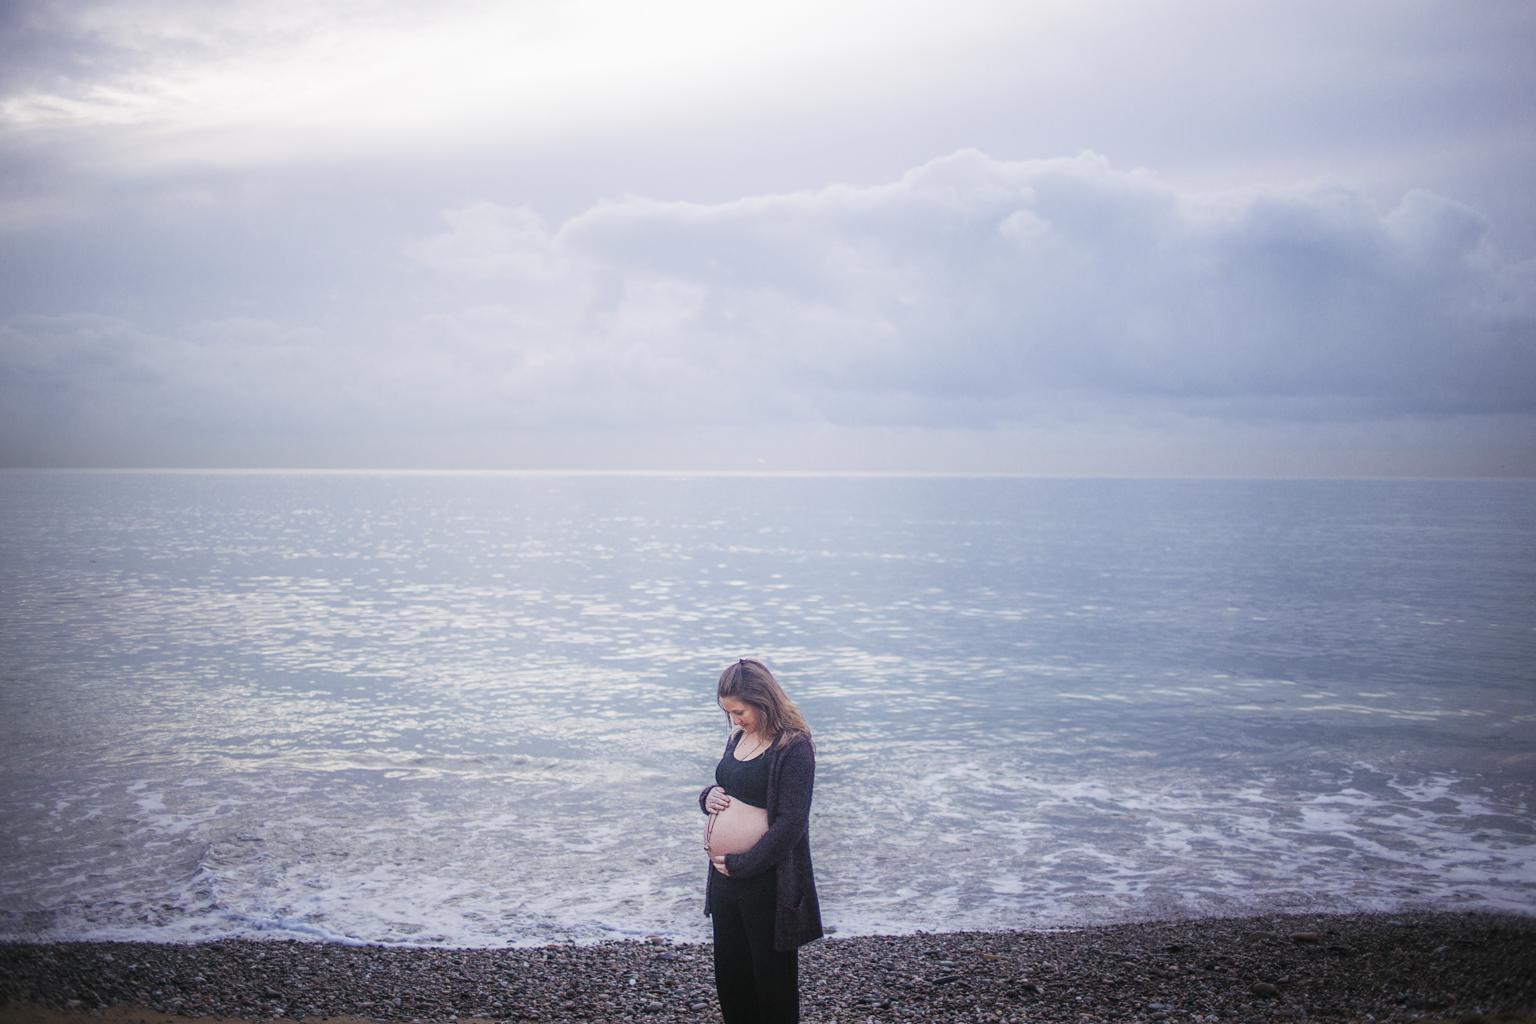 Fotógrafo de embarazo barcelona playa :: fotografía embarazada playa Barcelona :: fotógrafo de embarazada